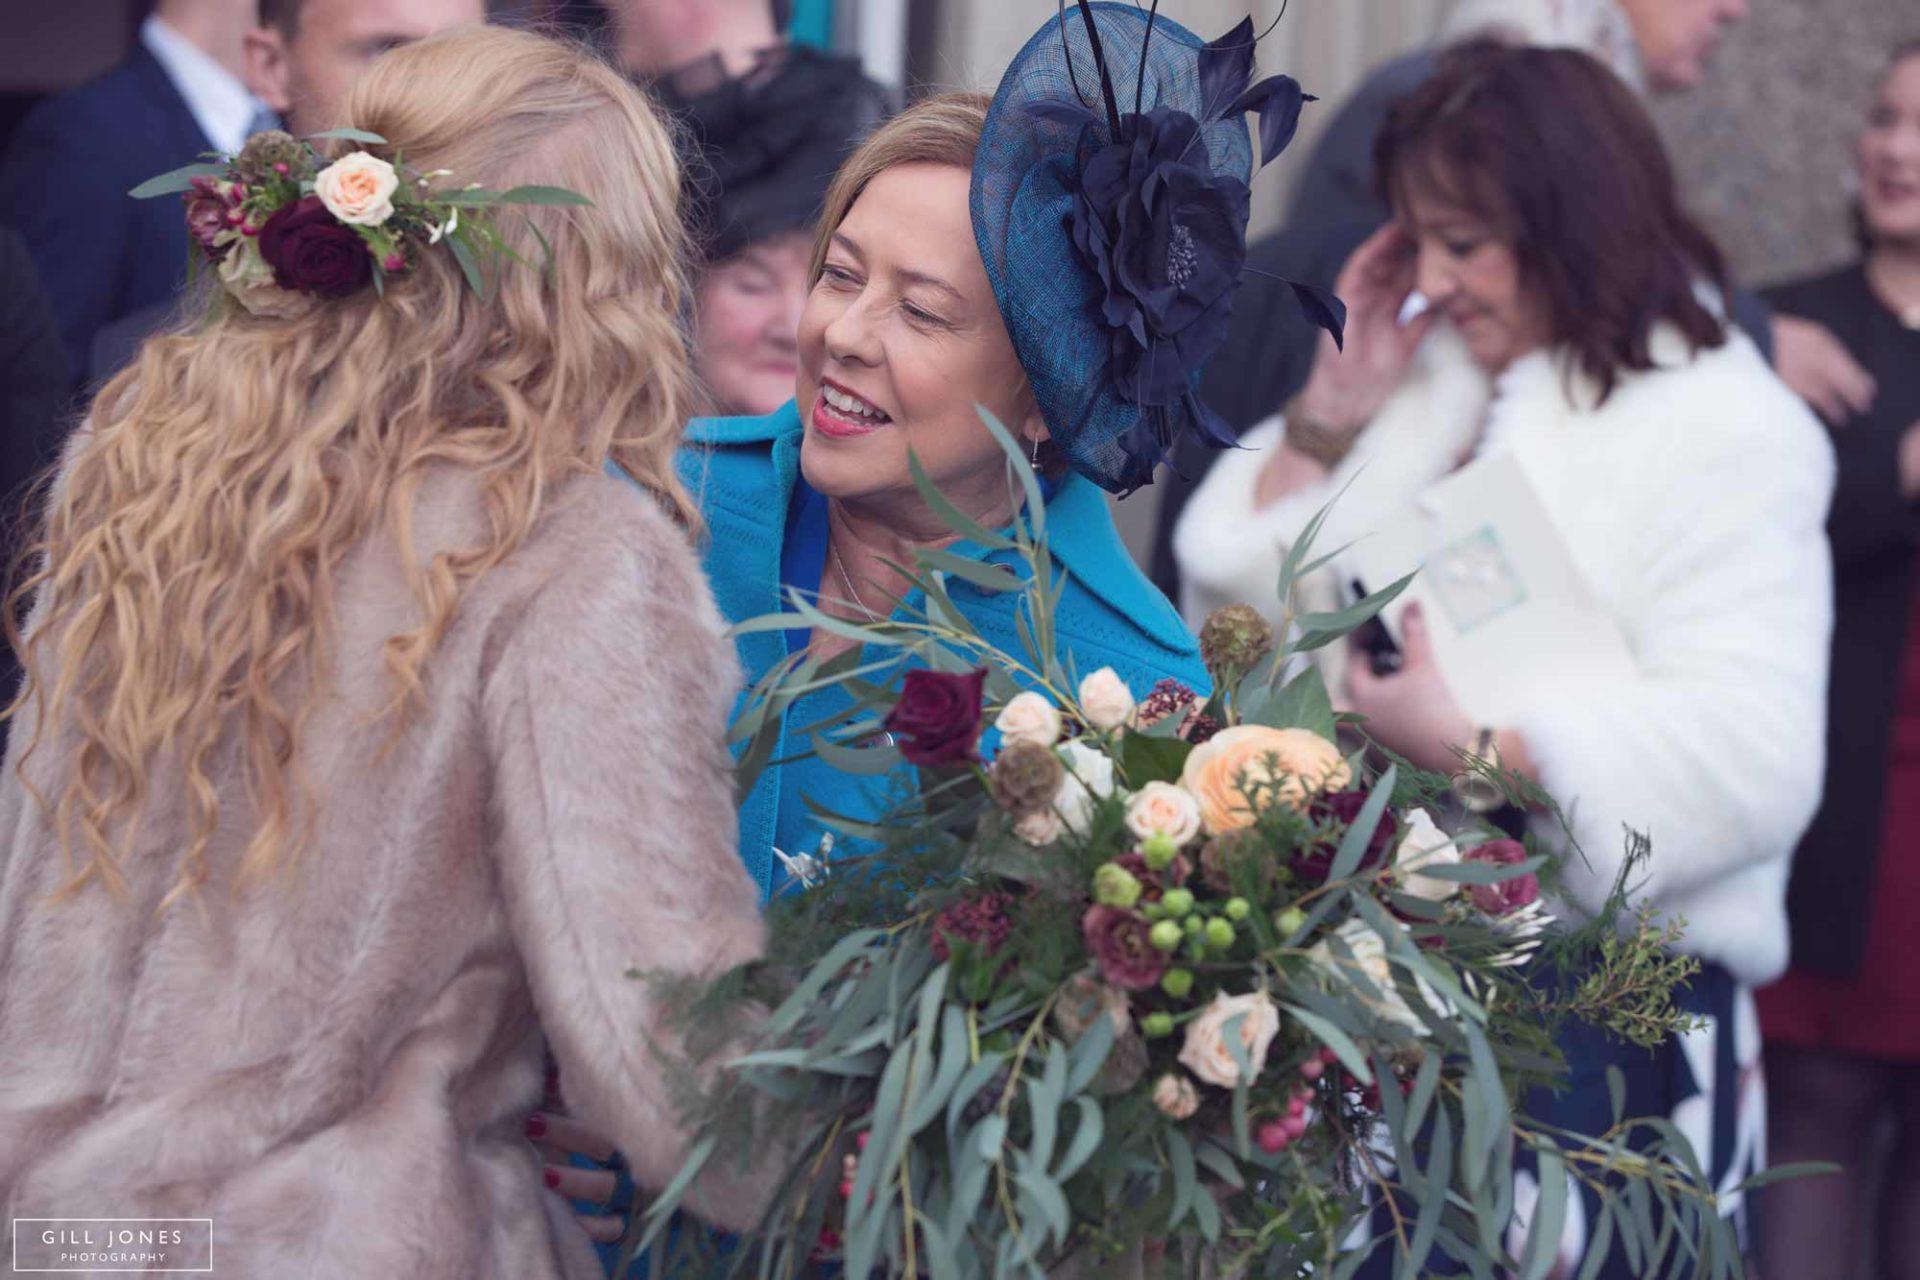 a guests hugging the bride